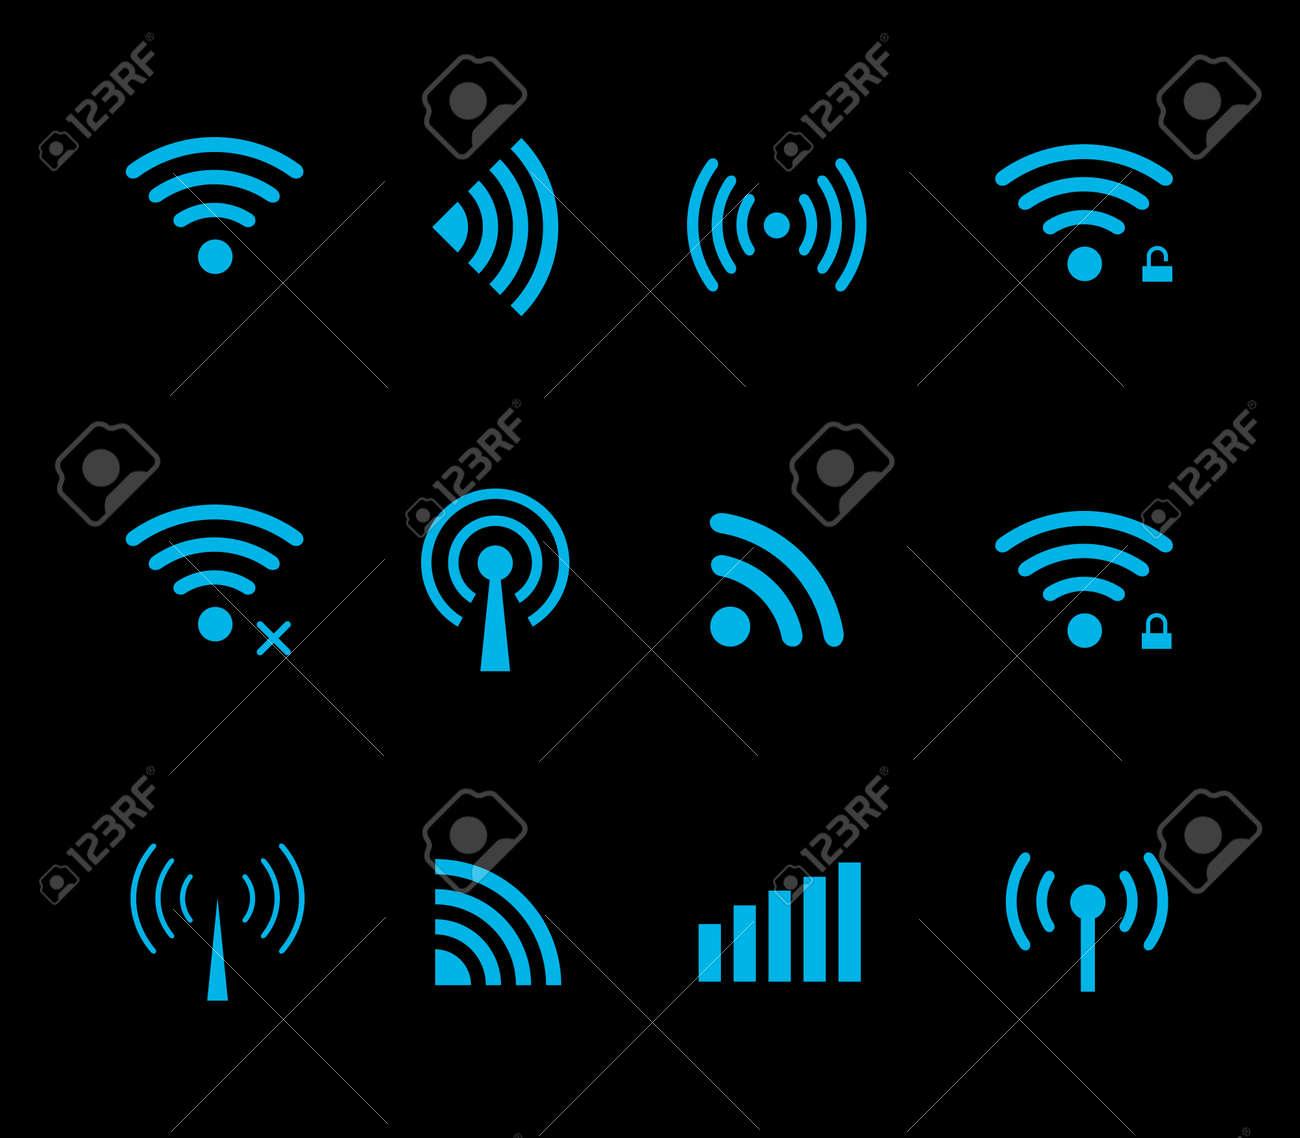 Neon futuristic vector wireless and wifi icon for remote access and communication via radio waves. Wireless logo. Set of indicators. Wi-fi logo. Remote icon. Bar element, internet load. Free wifi icon - 55017714